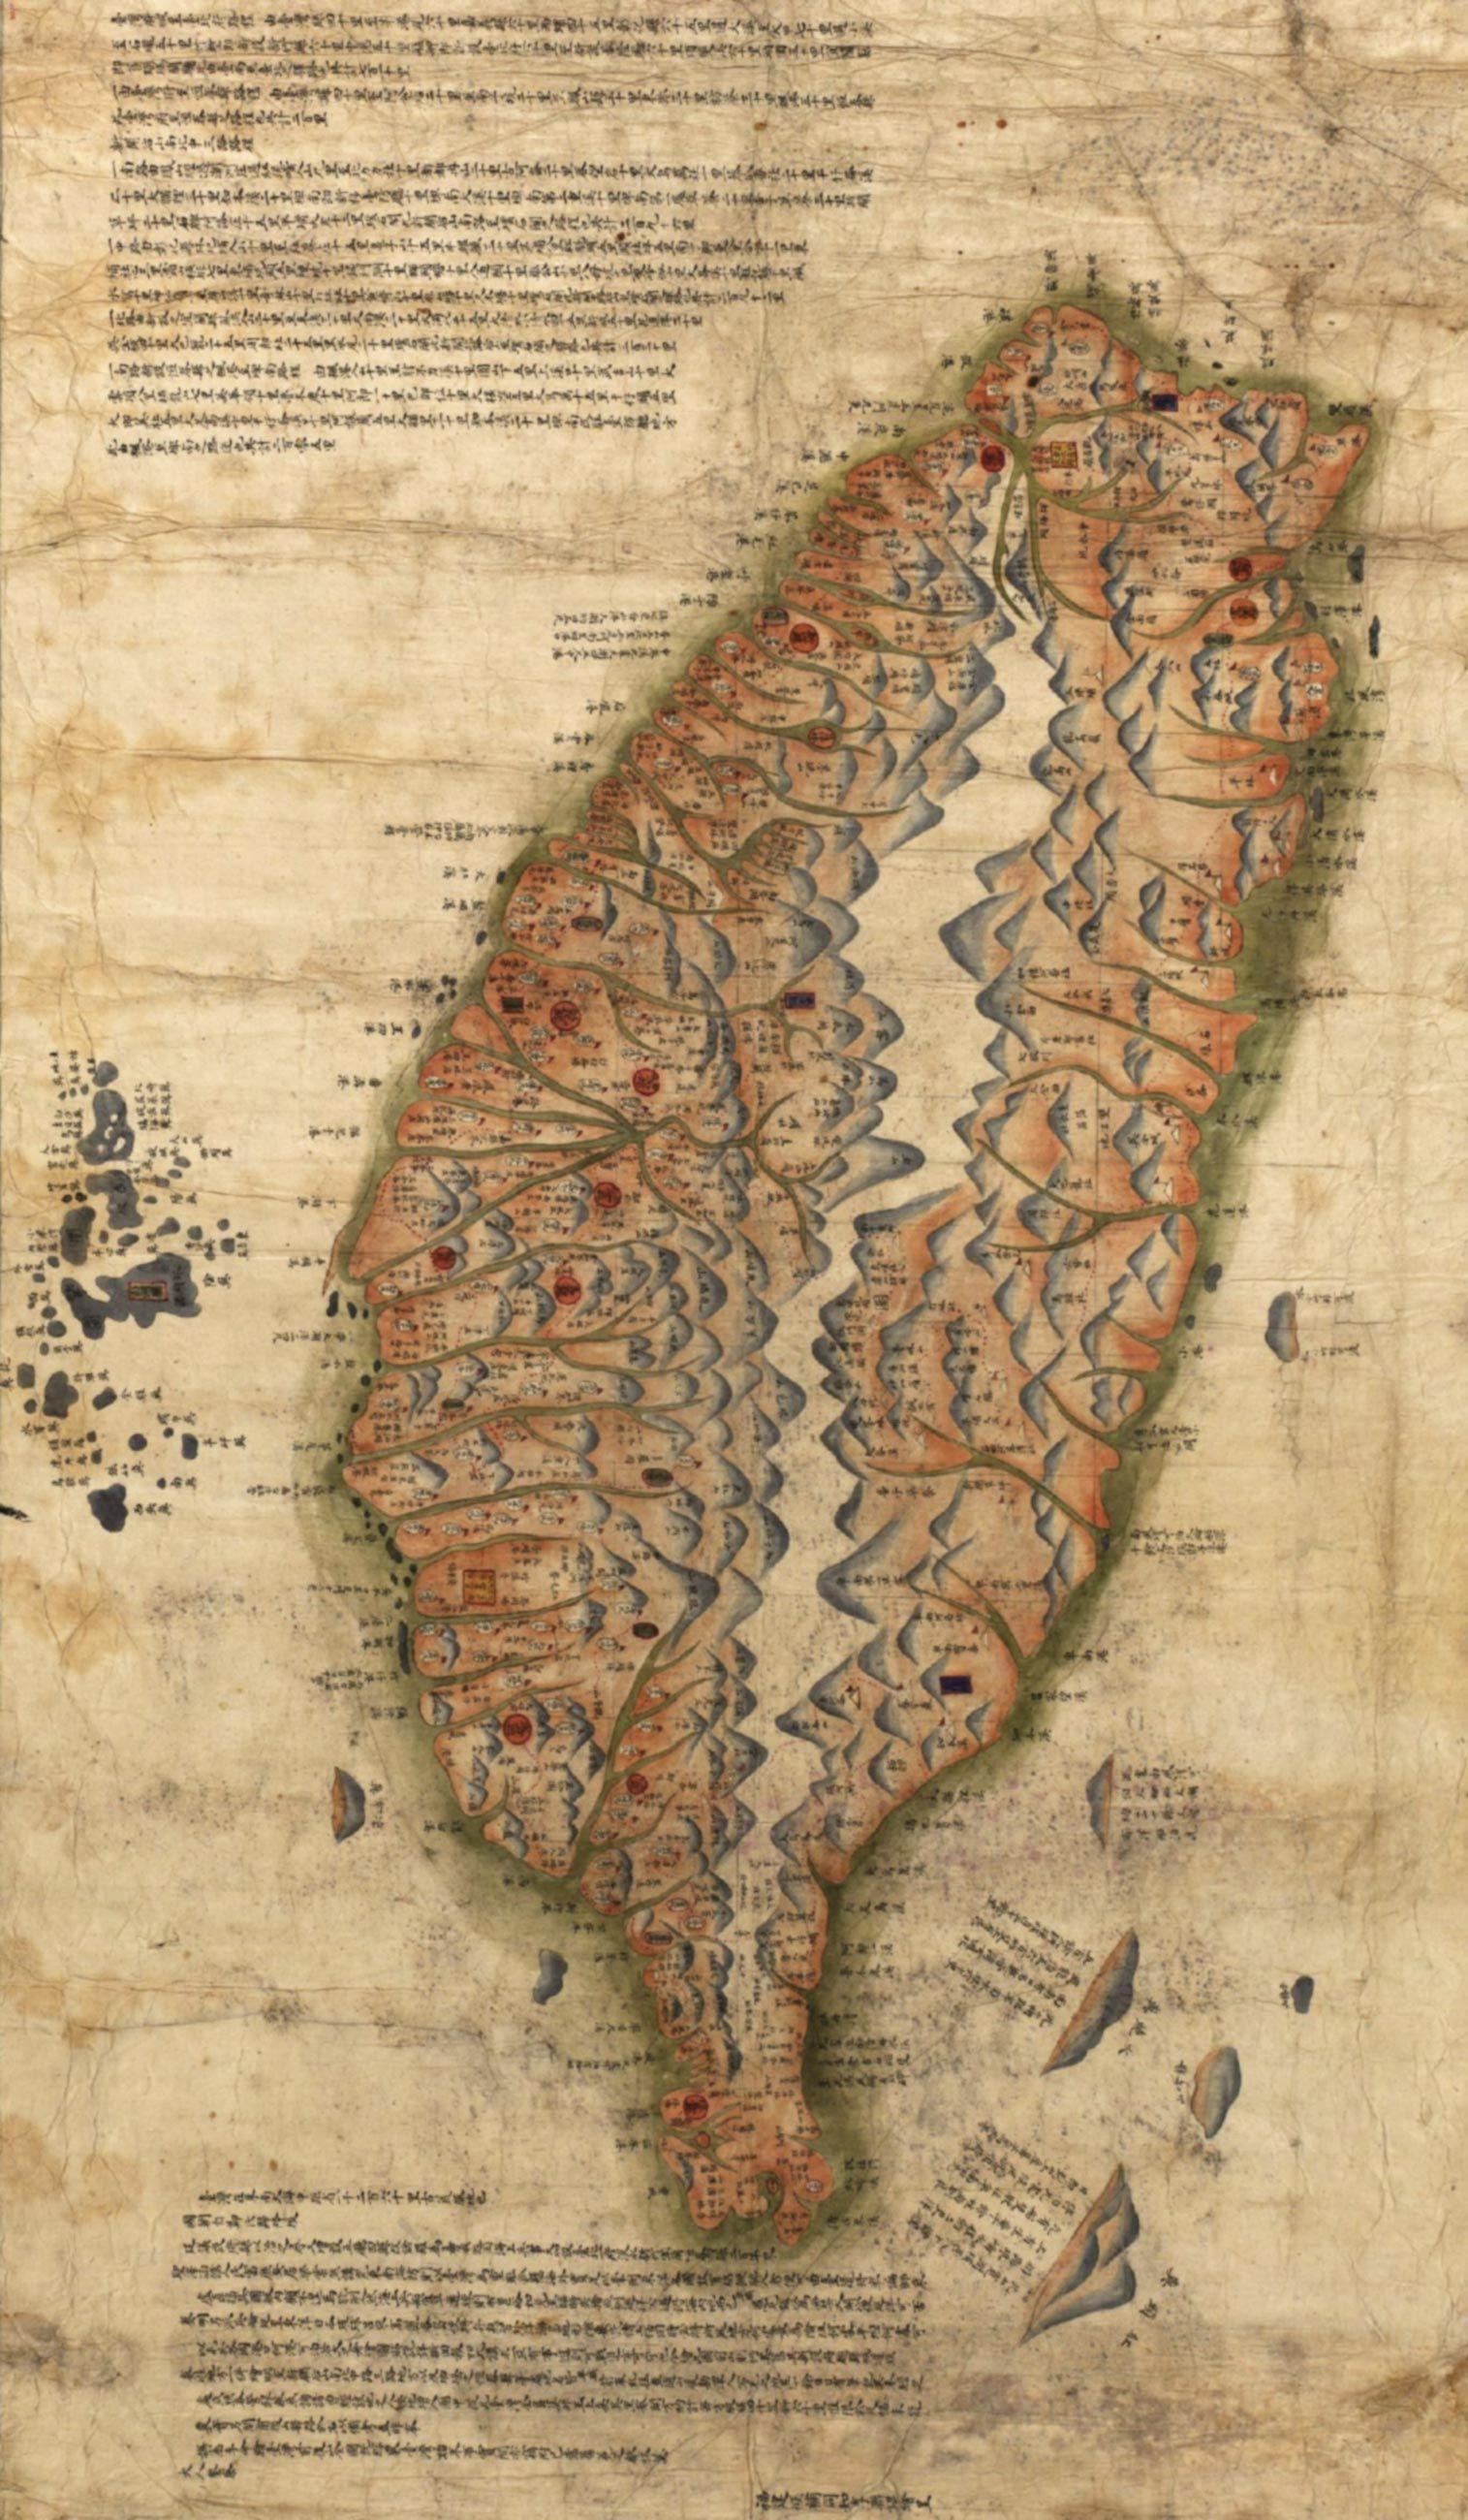 Fonte figura 4: Li Liankun, «Taiwan qian hou shan quan tu» («Taiwan ai due lati delle sorgenti di montagna»), 1875-1880 circa (Library of Congress).